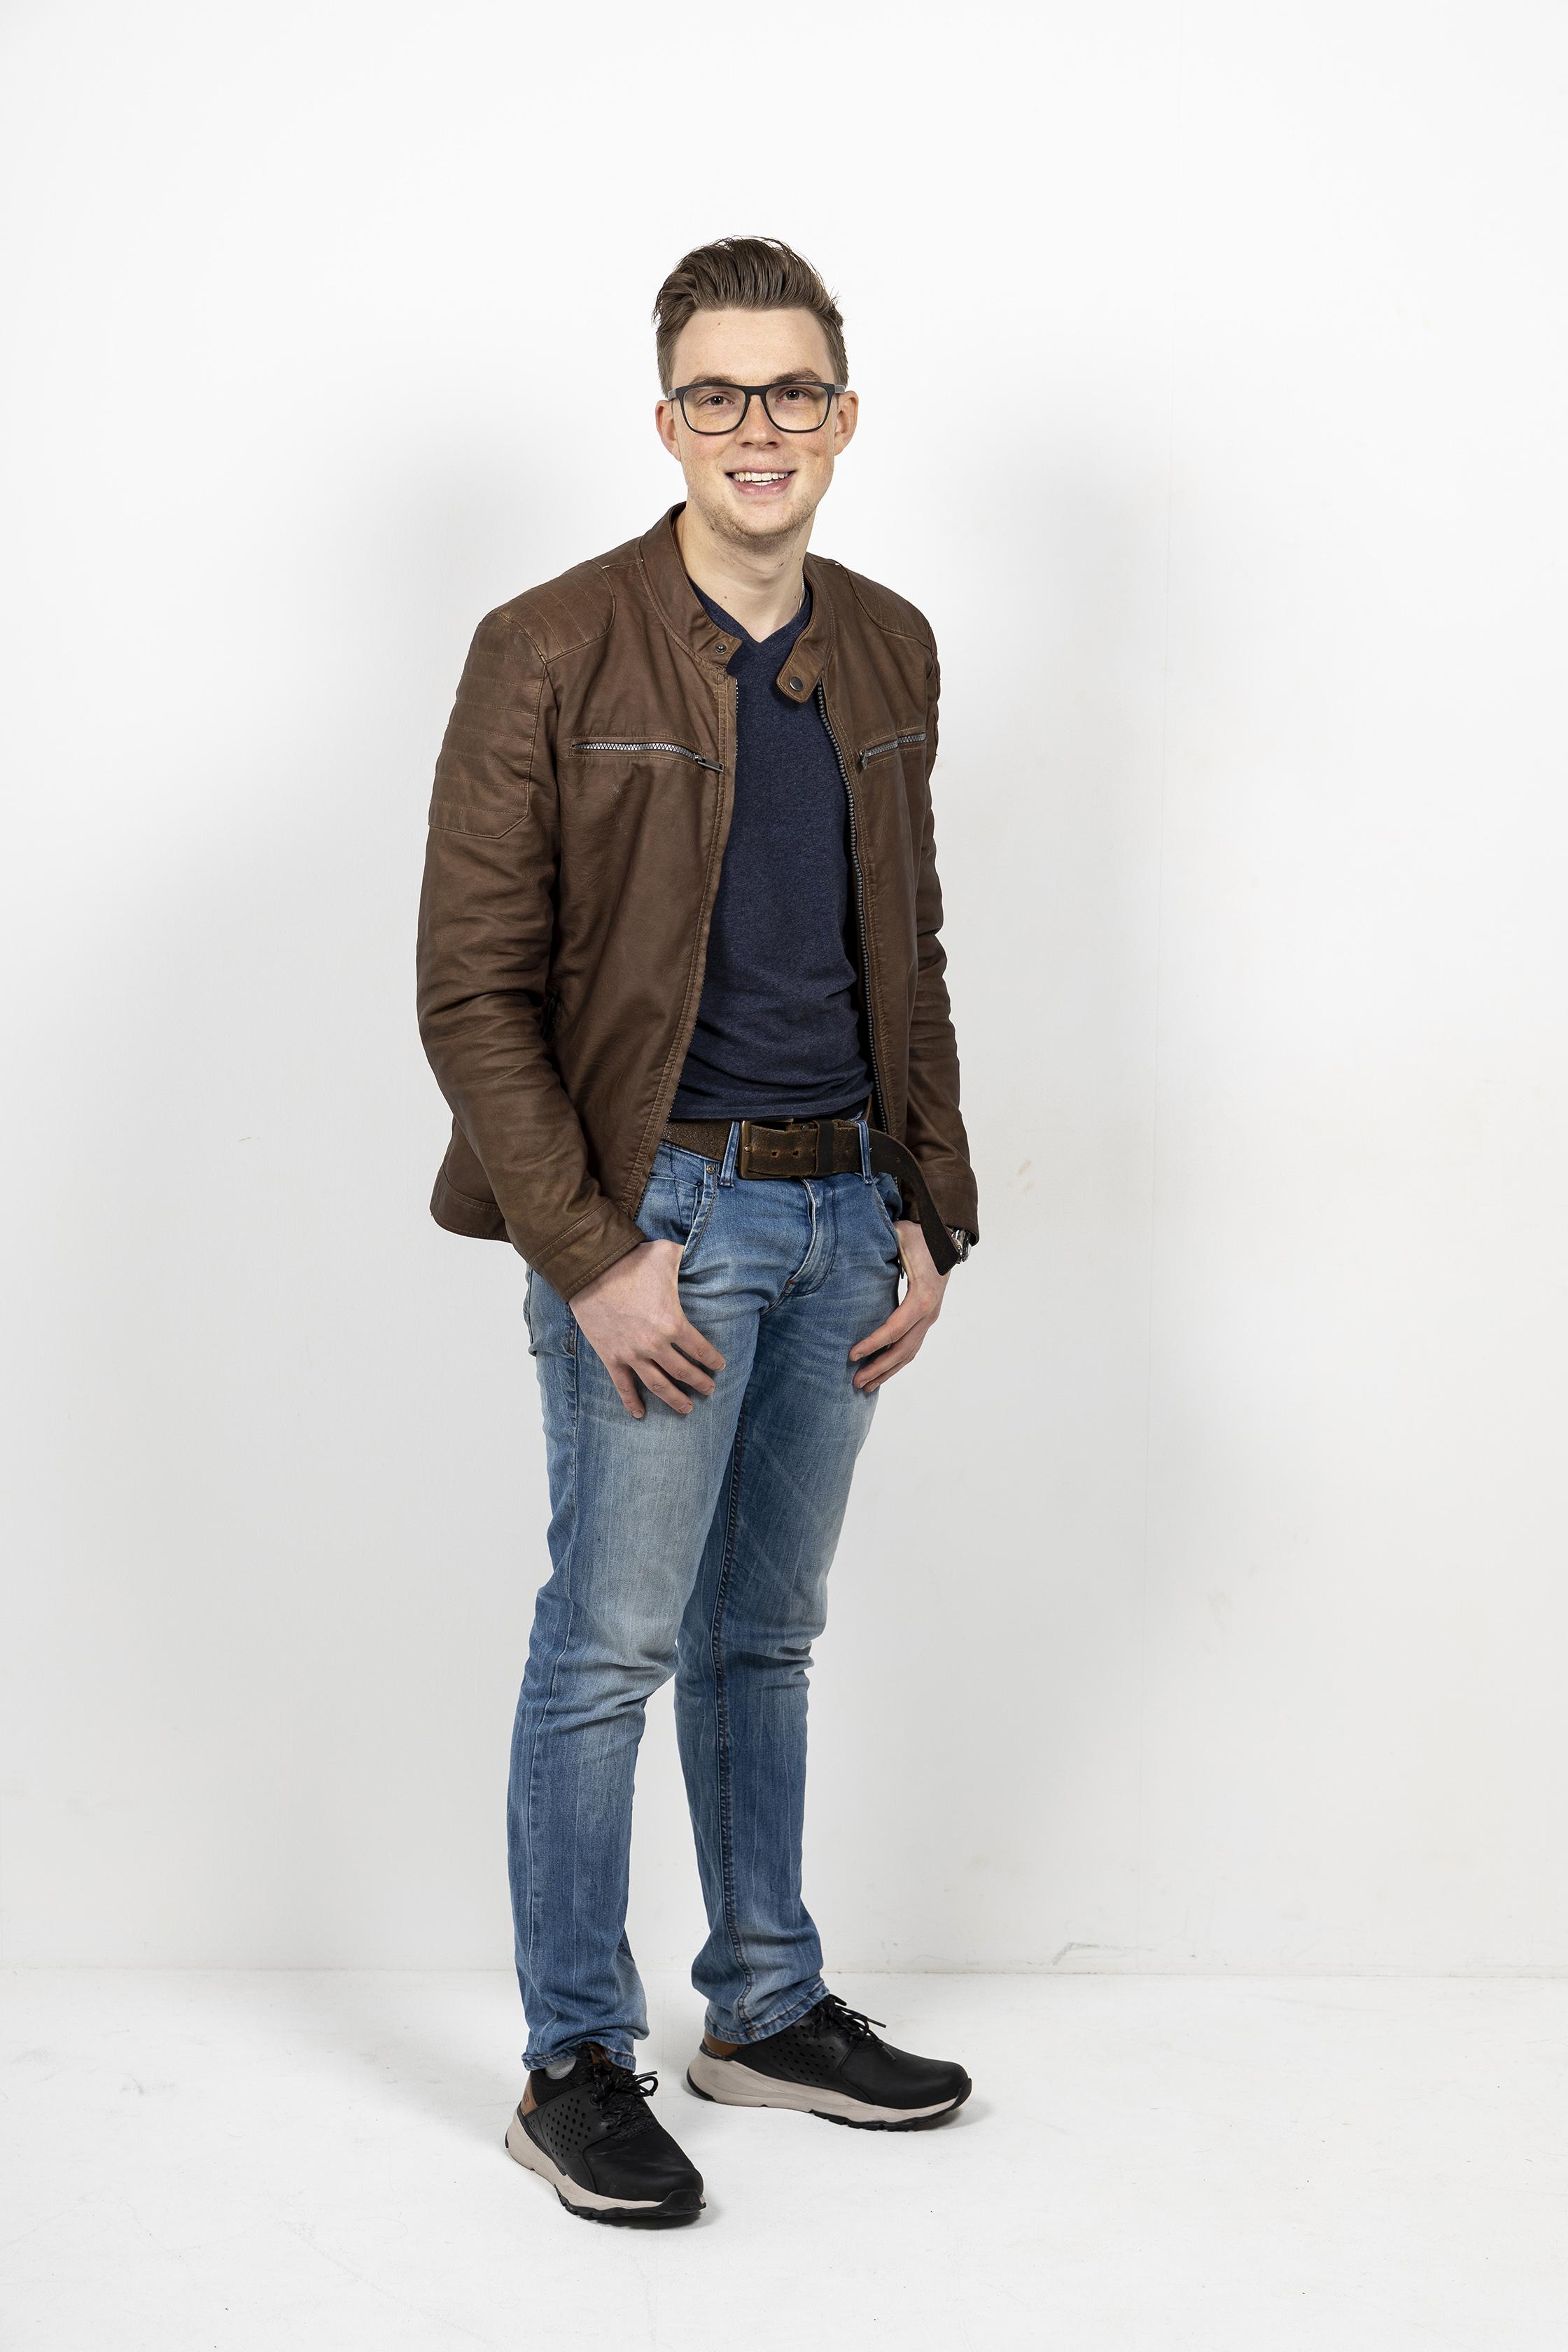 Joris Mosterdijk